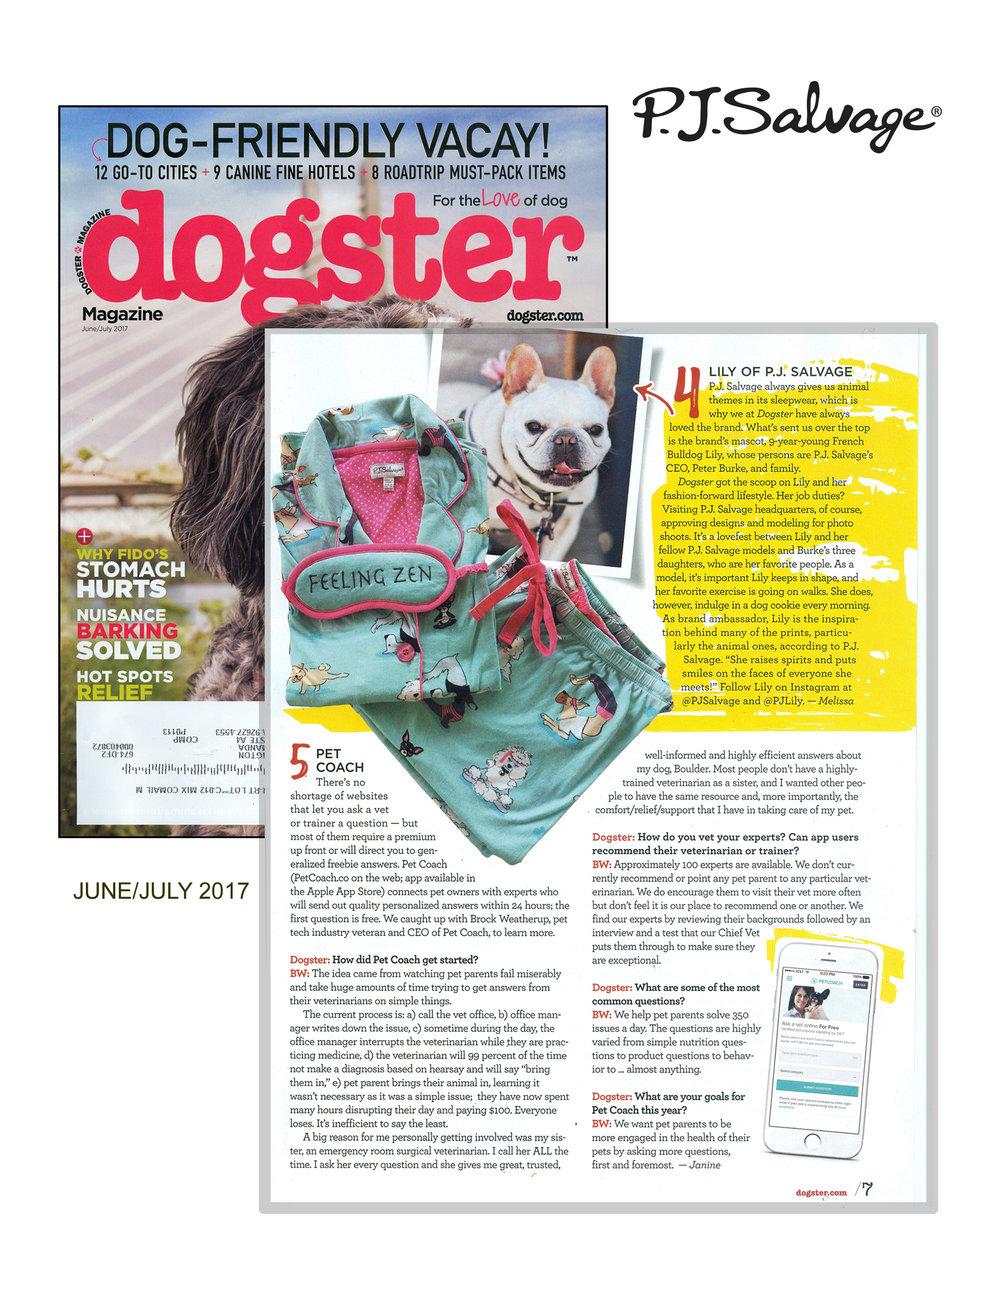 Dogster_JuneJuly2017.jpg